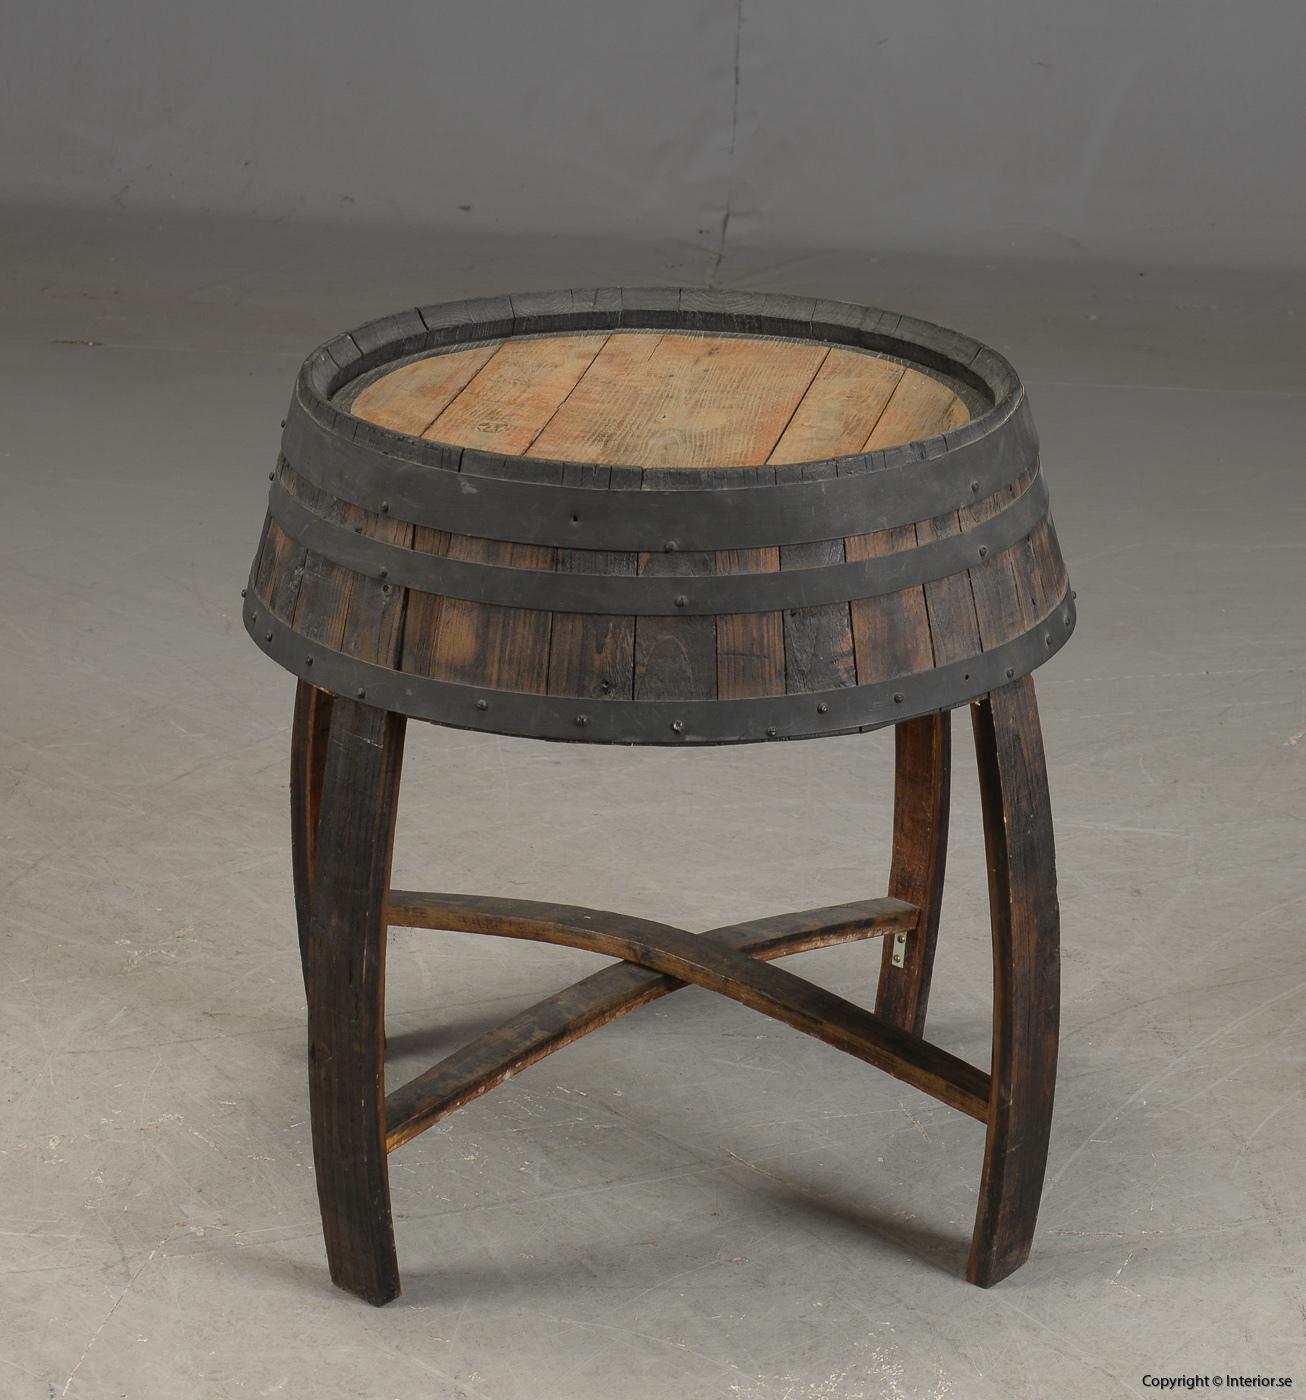 Möbler av vintunnor  wine barrels Meubels gemaakt van wijntunnels Möbel aus Weintunneln, sittpallar & bord 4